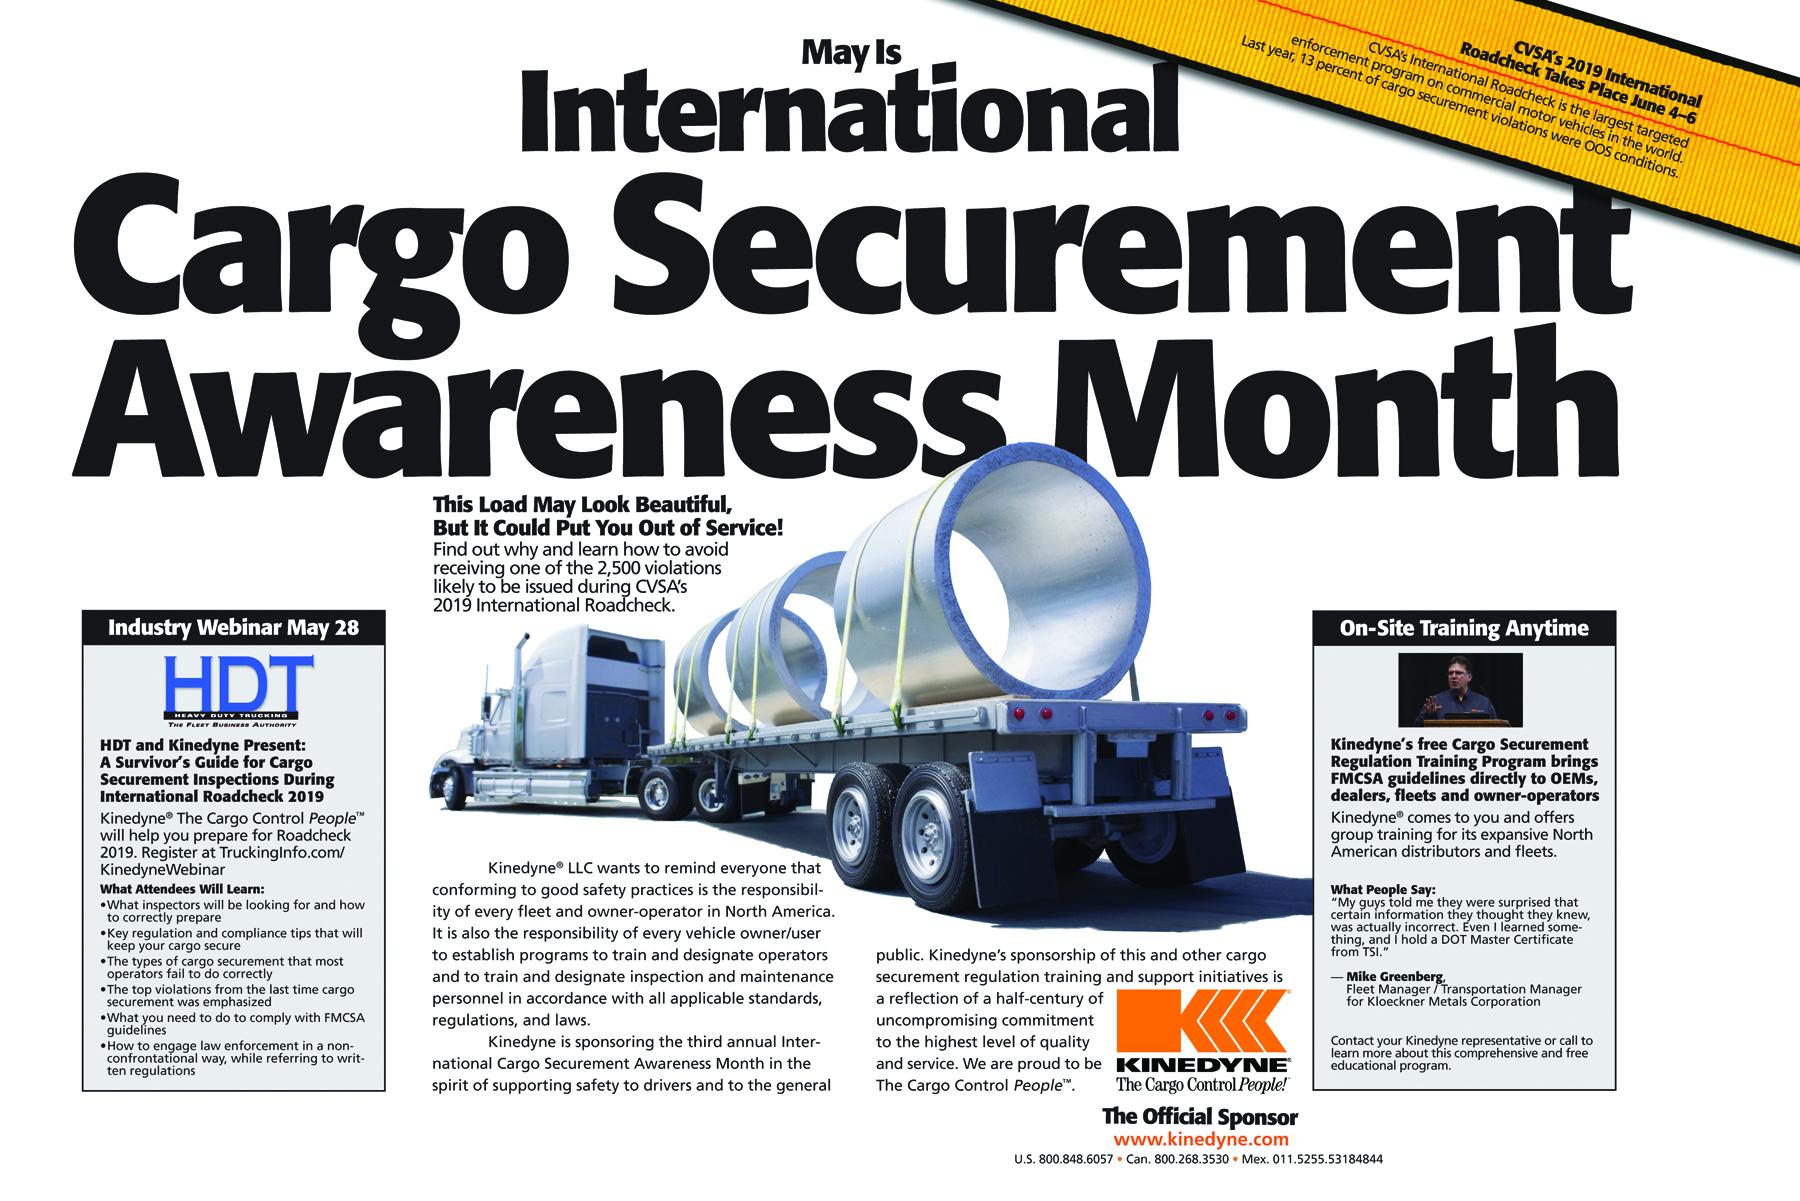 Kinedyne Sponsors Third Annual International Cargo Securement